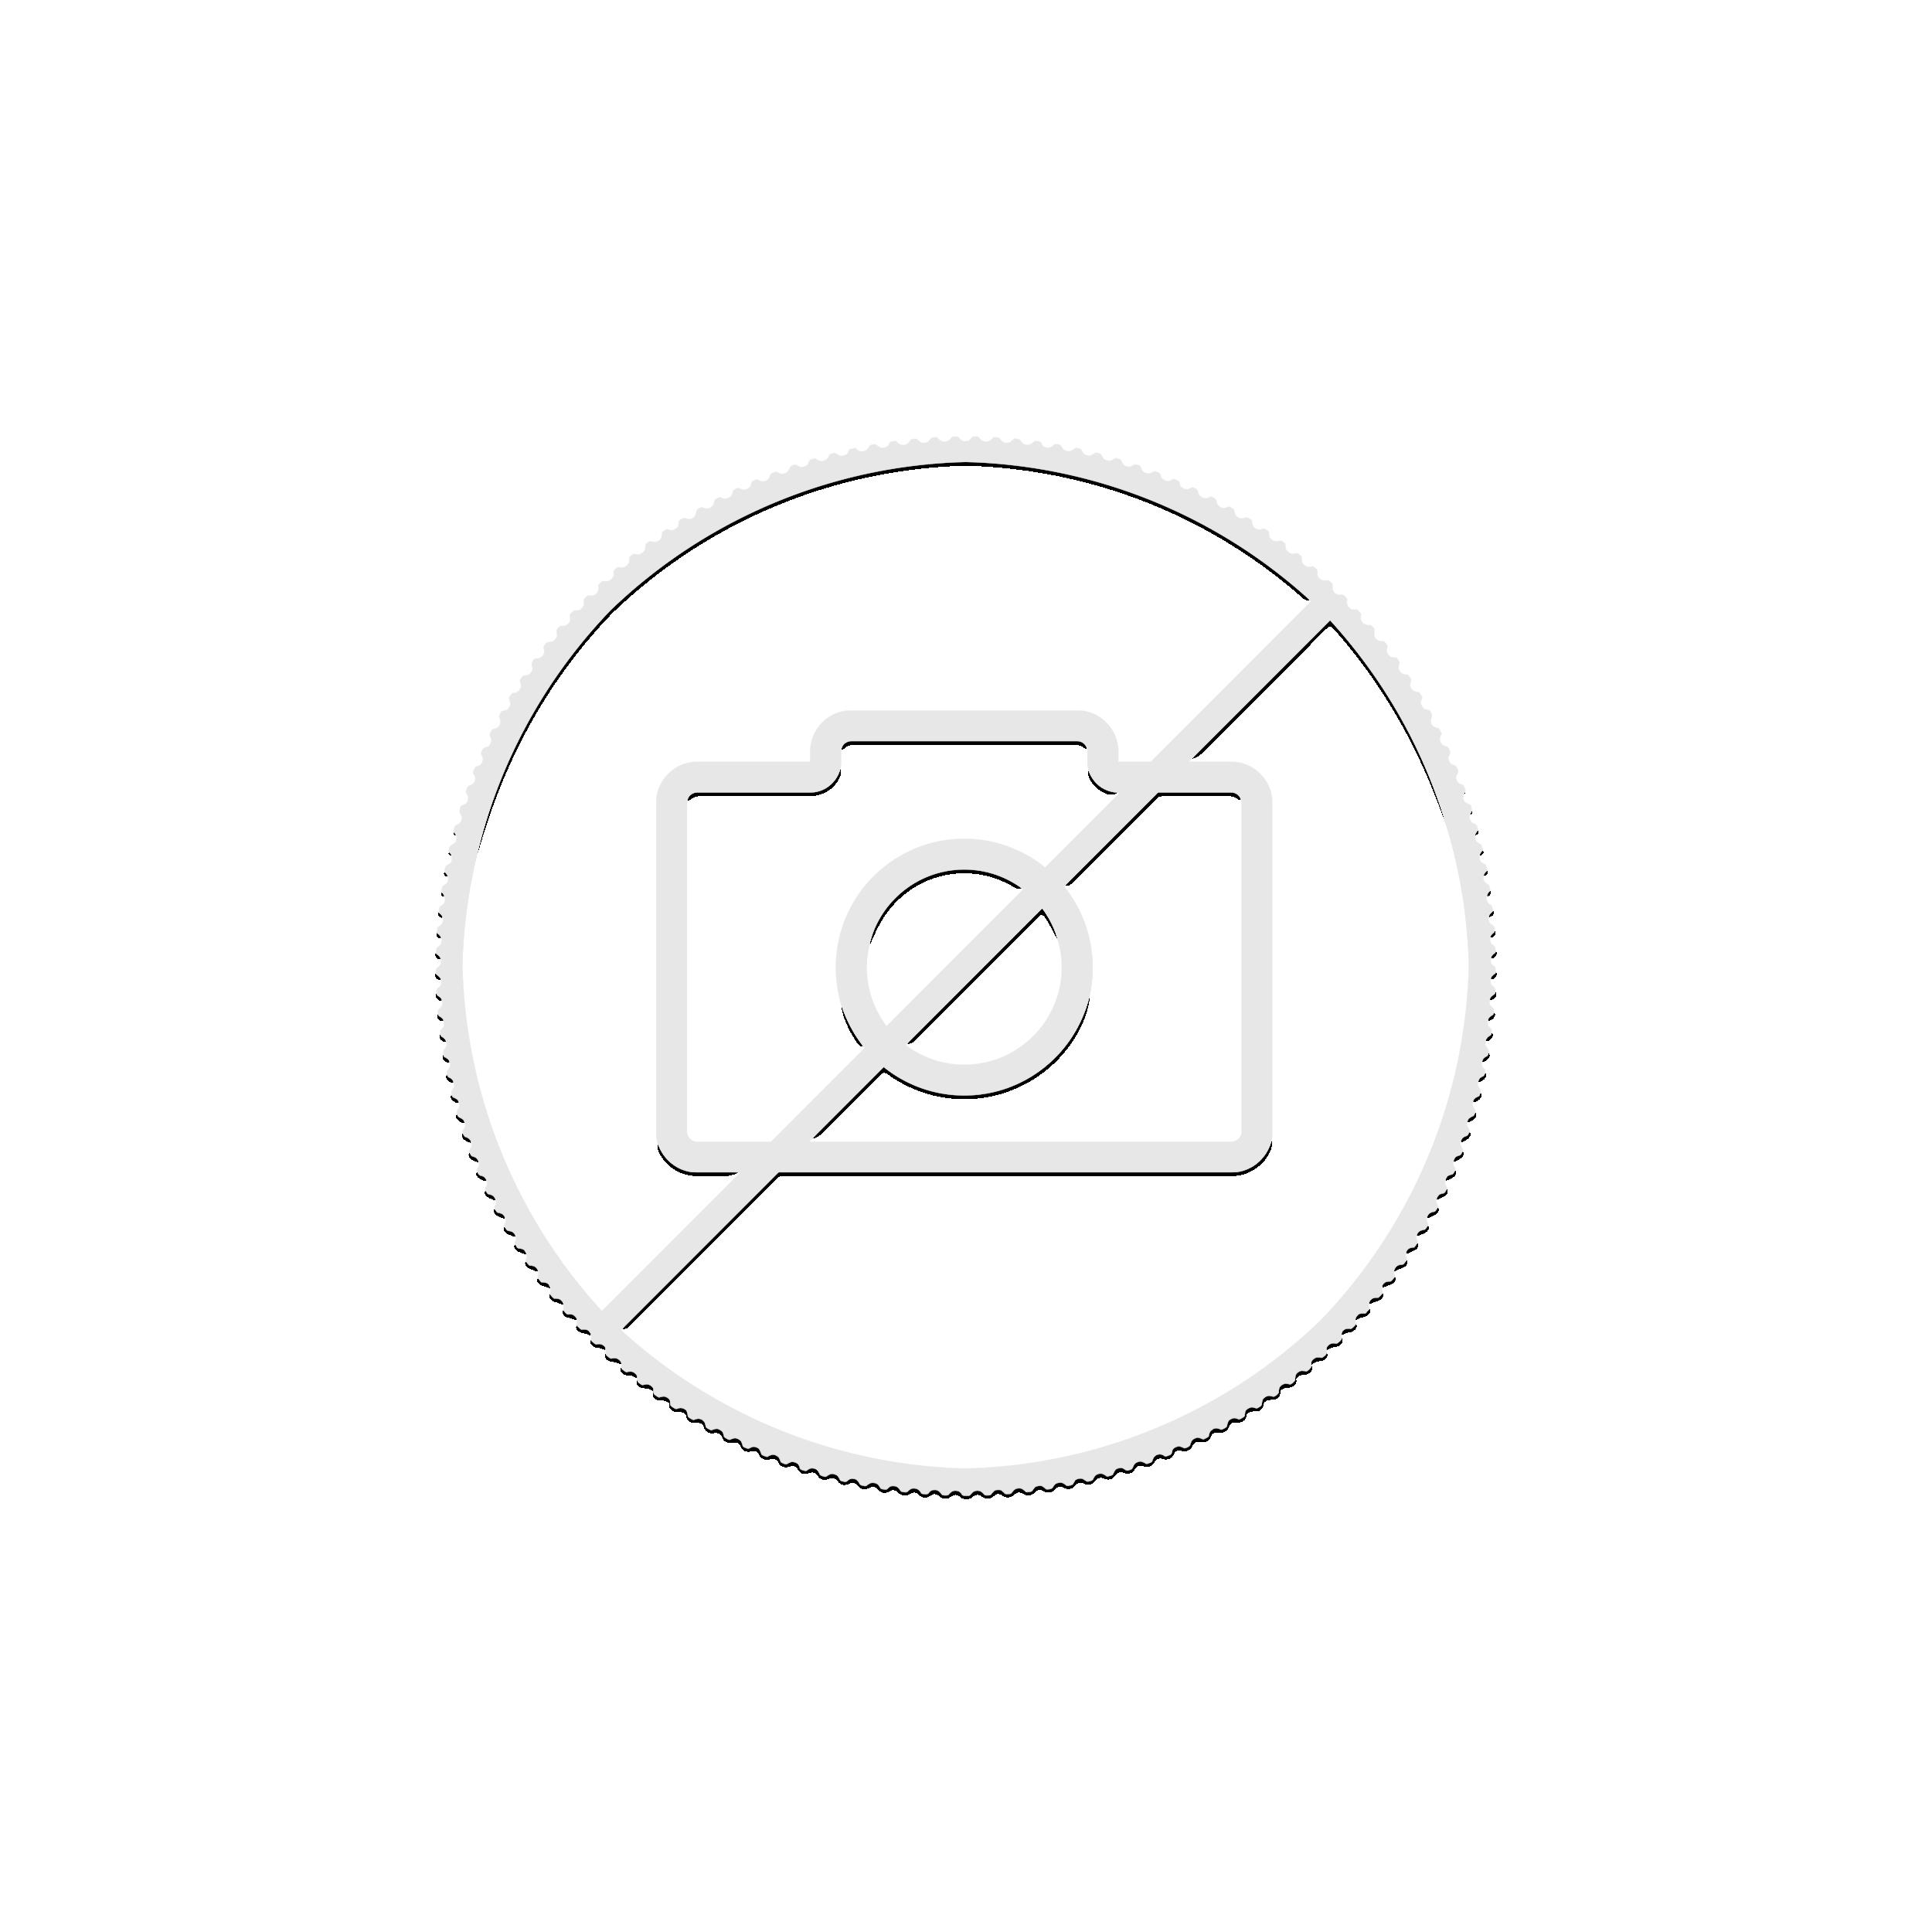 15 Gram gouden Panda munt 2016